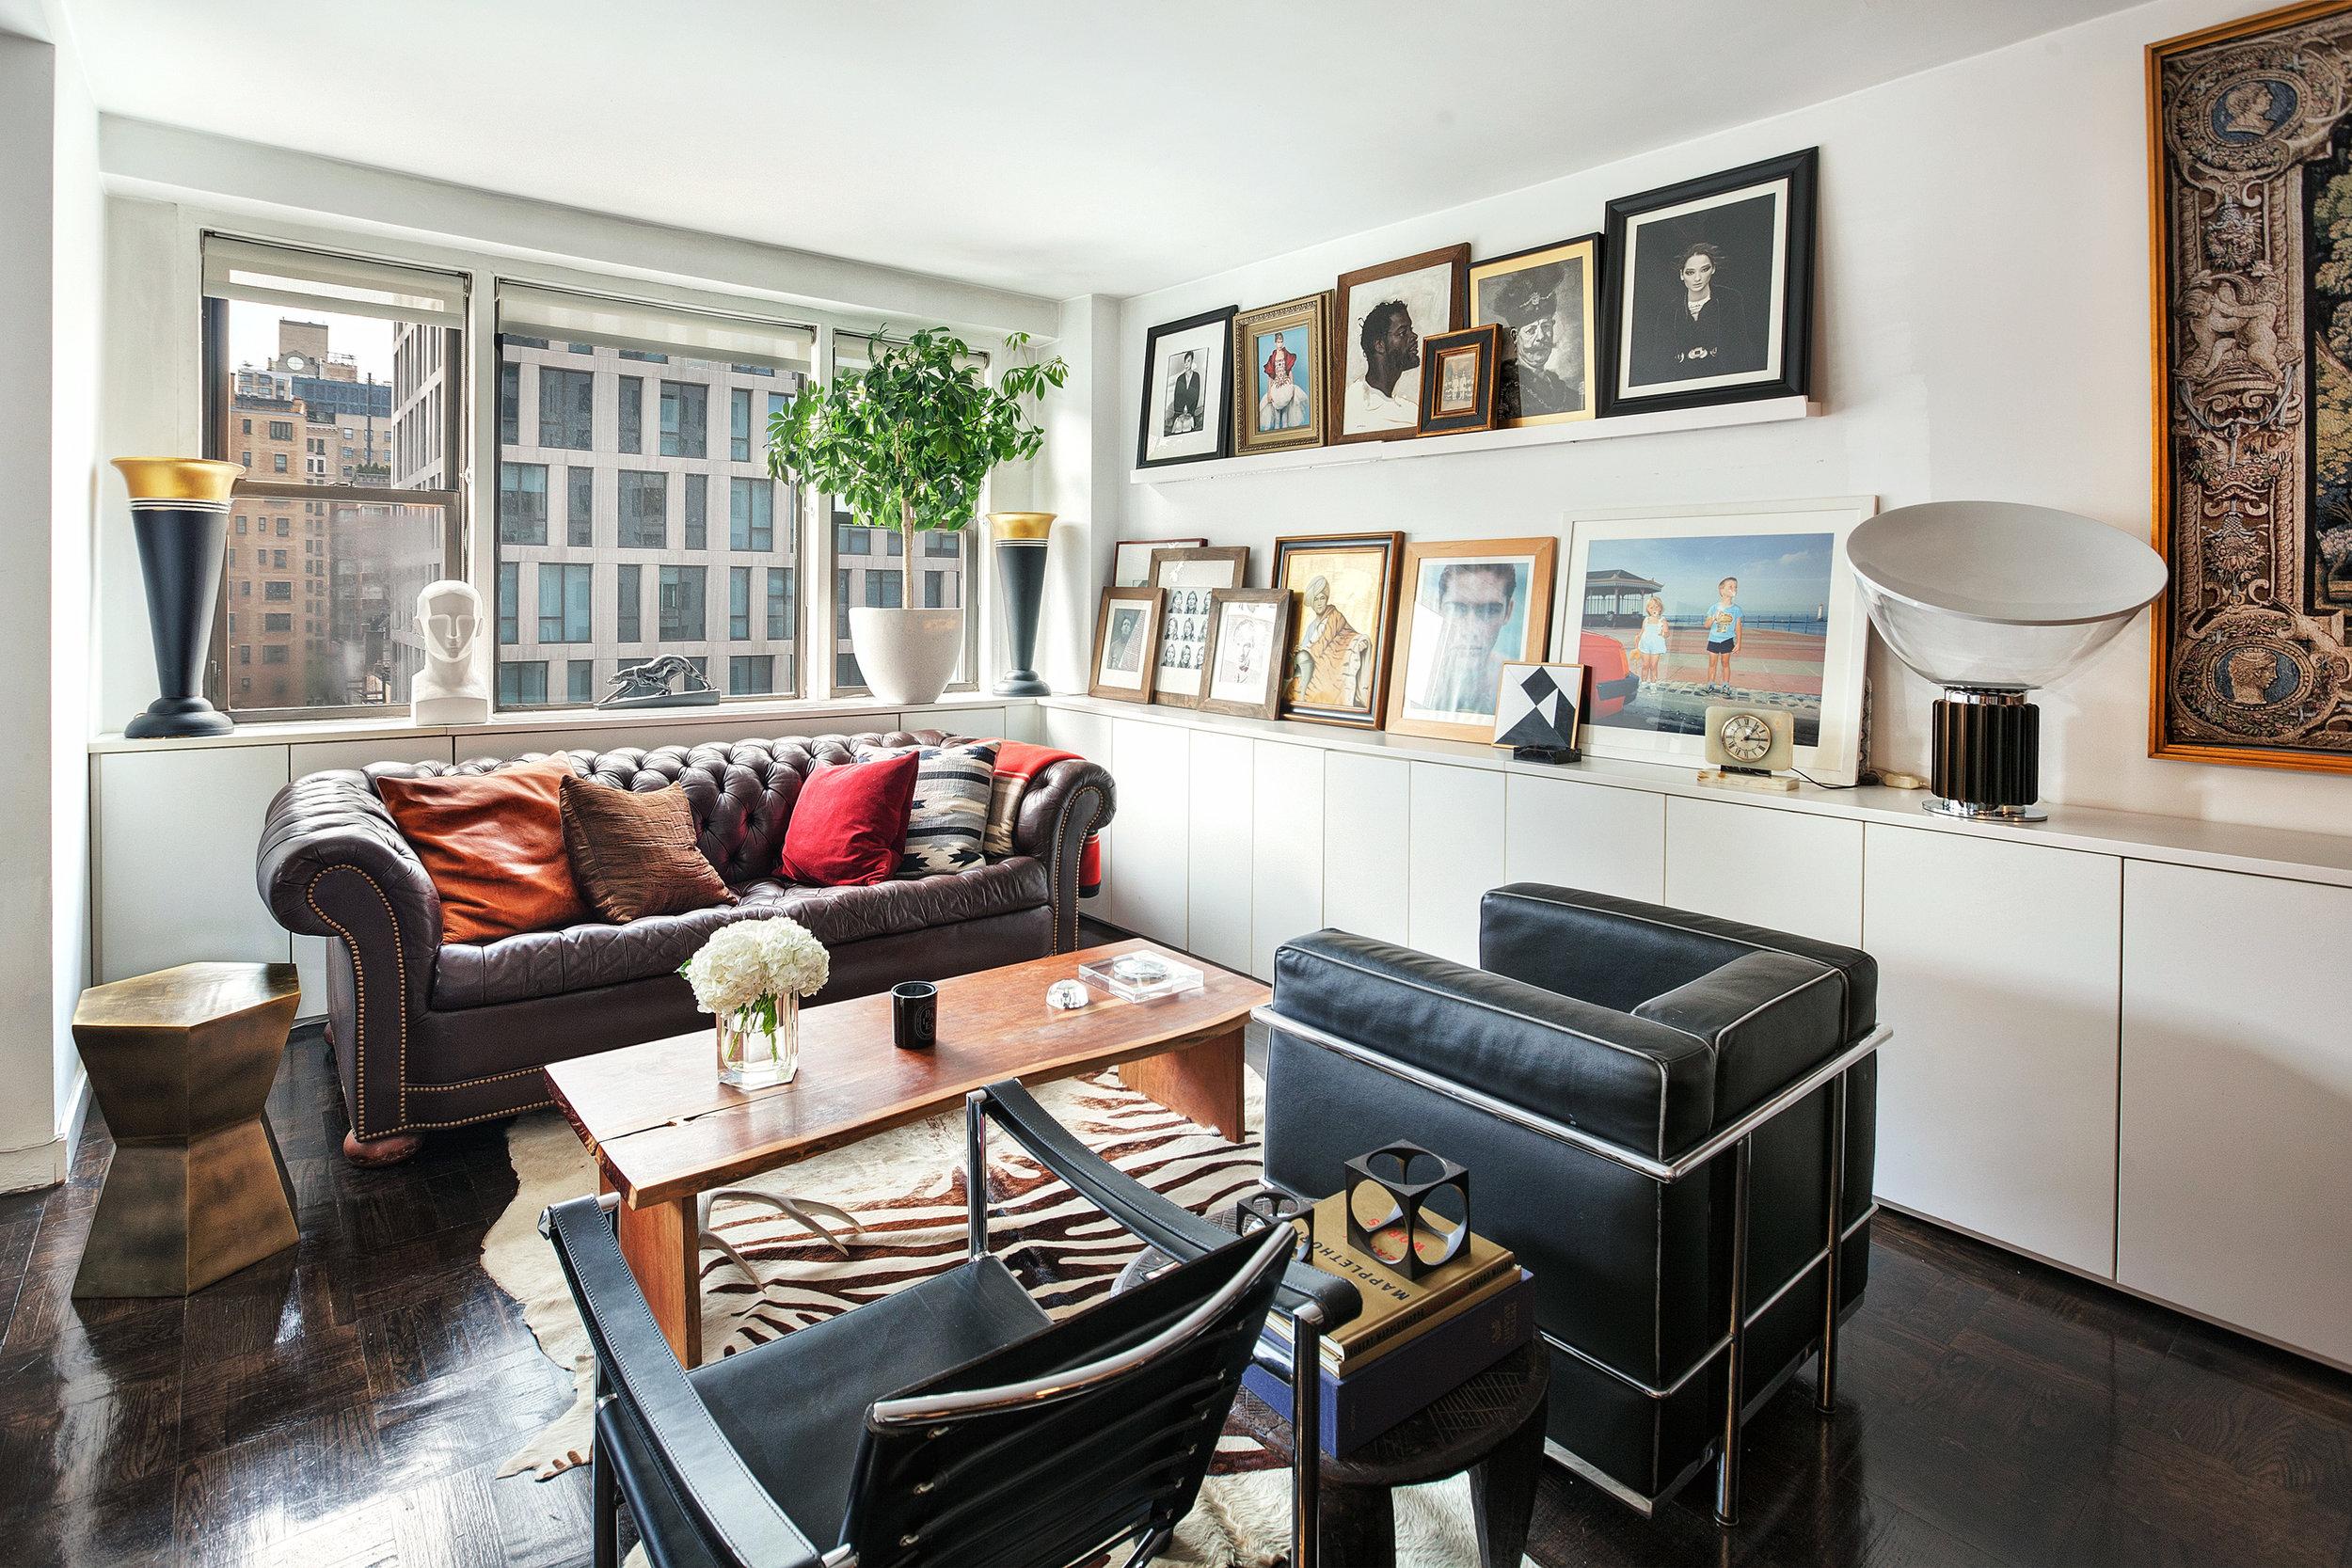 201 East 21st Street, #10B - $1,075,000